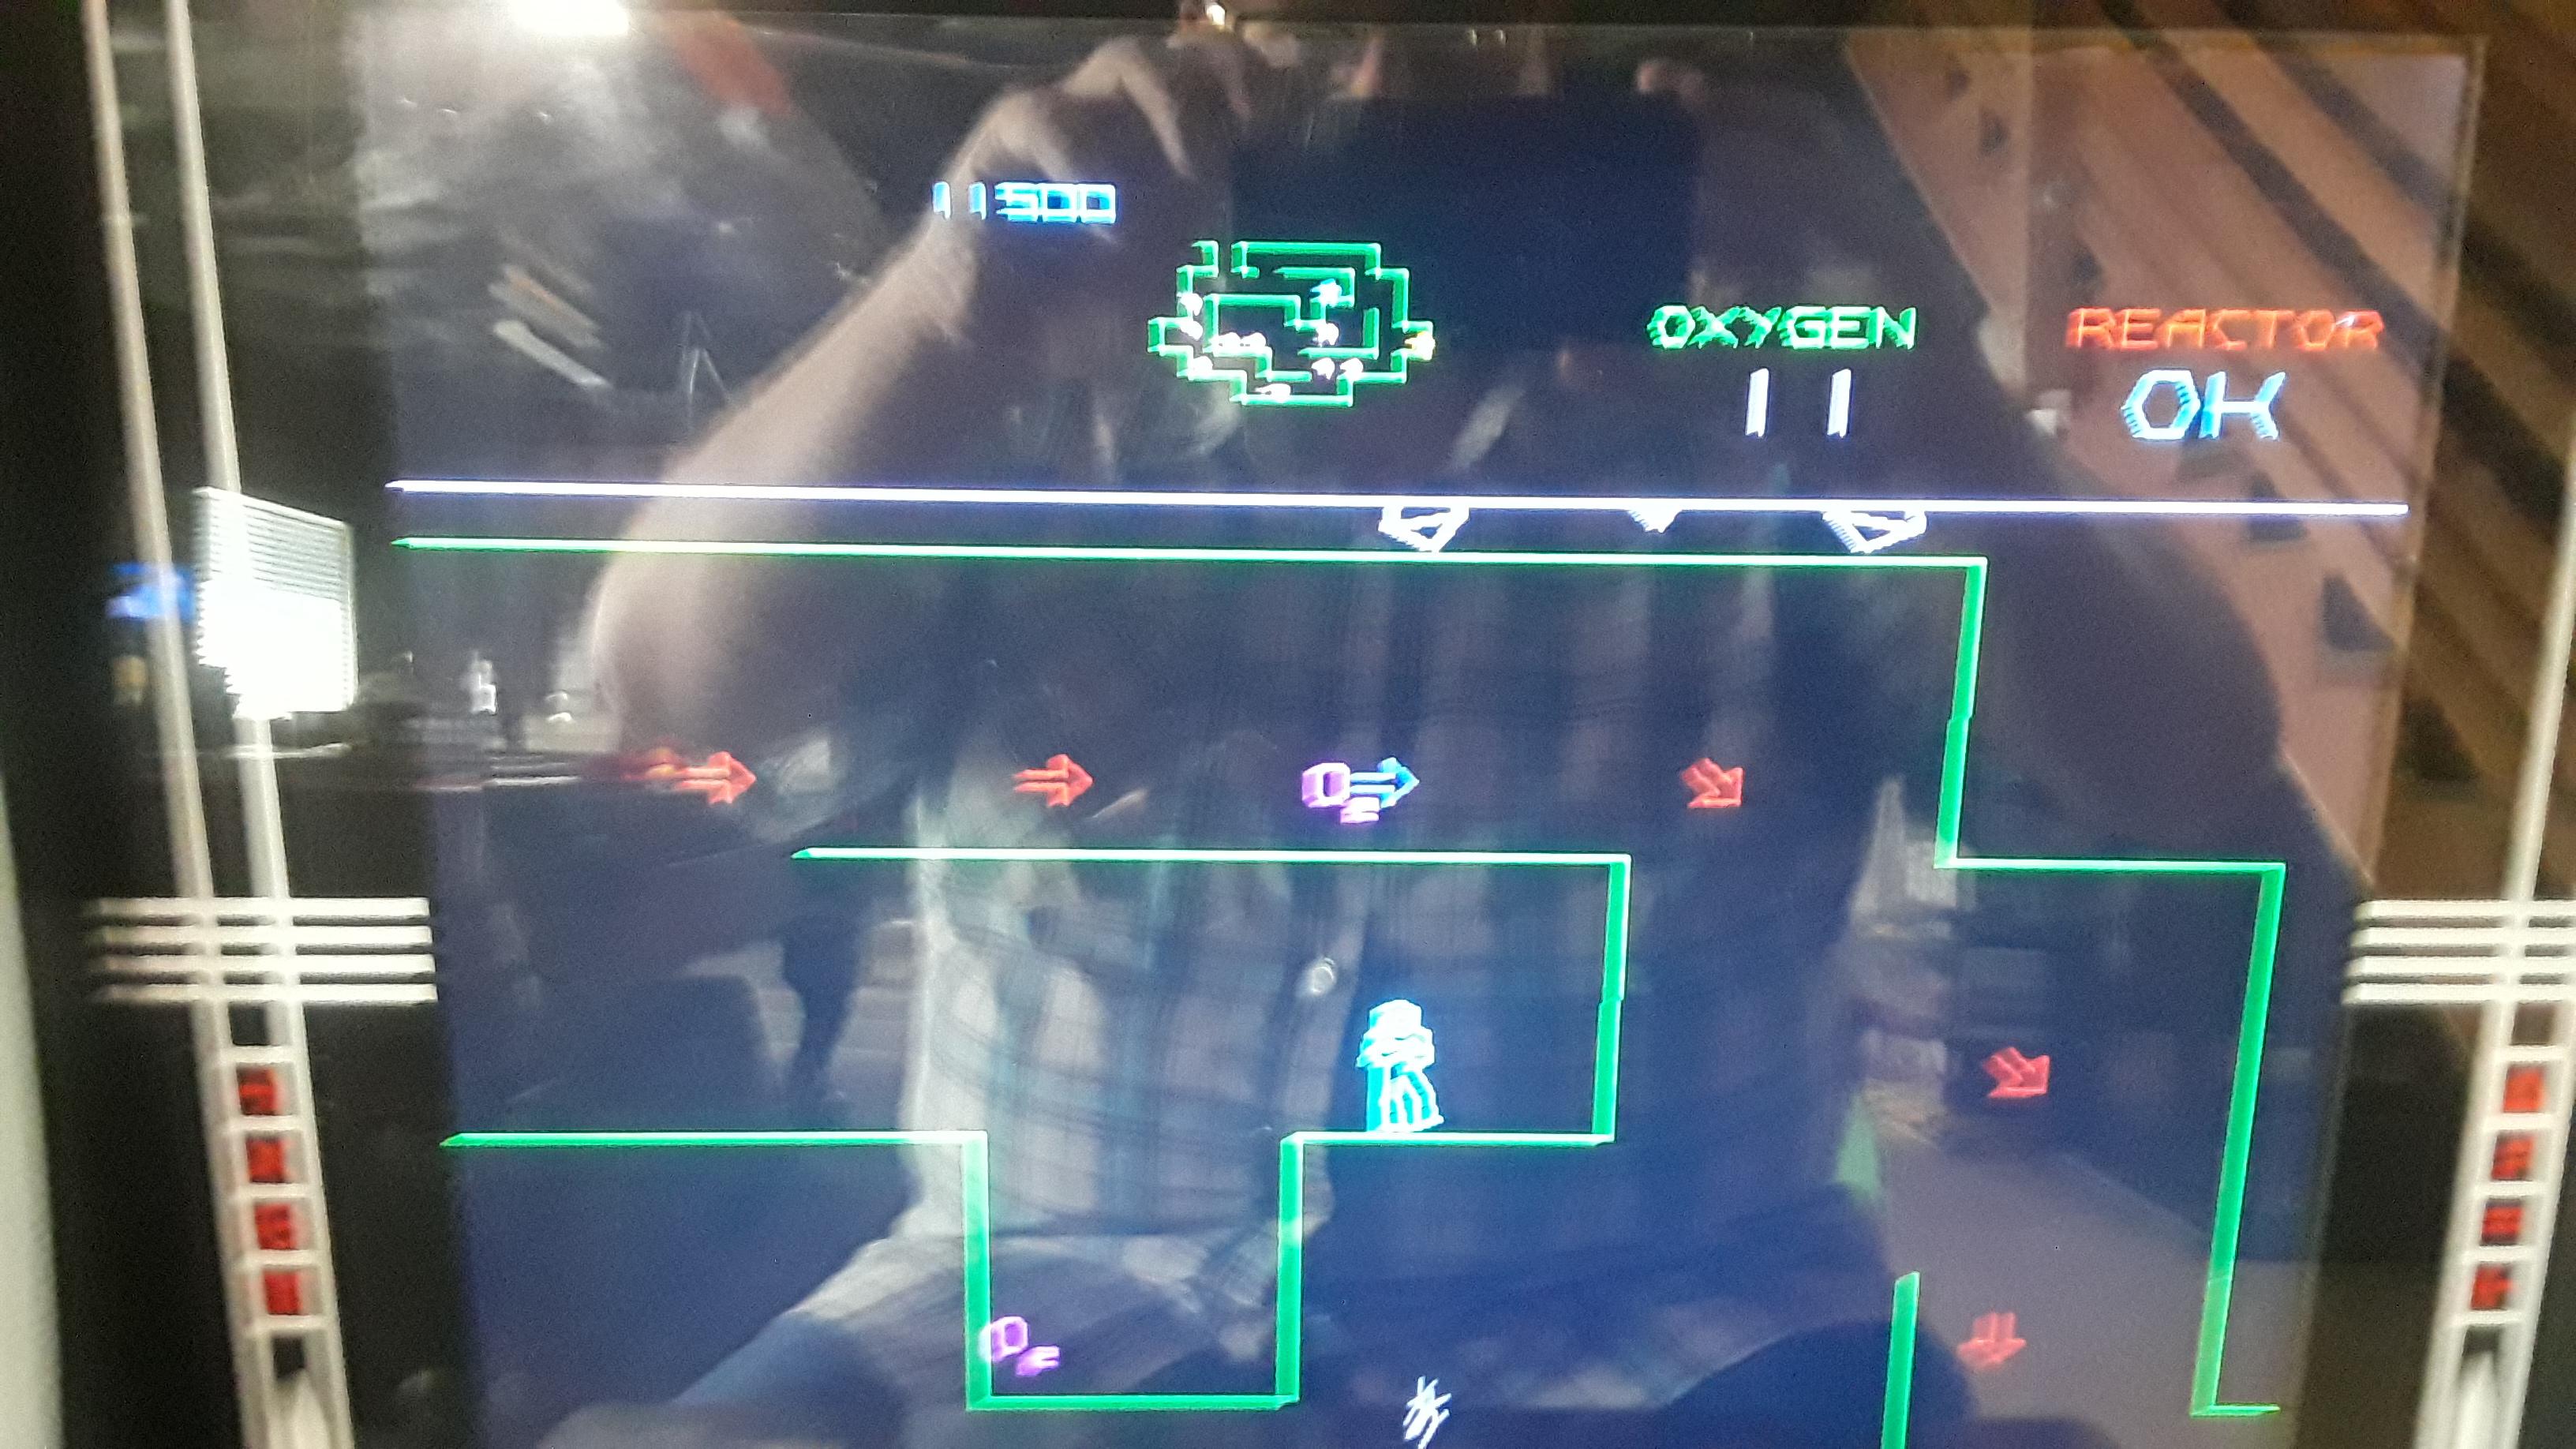 JML101582: Major Havoc (Arcade Emulated / M.A.M.E.) 11,500 points on 2019-11-28 16:48:36